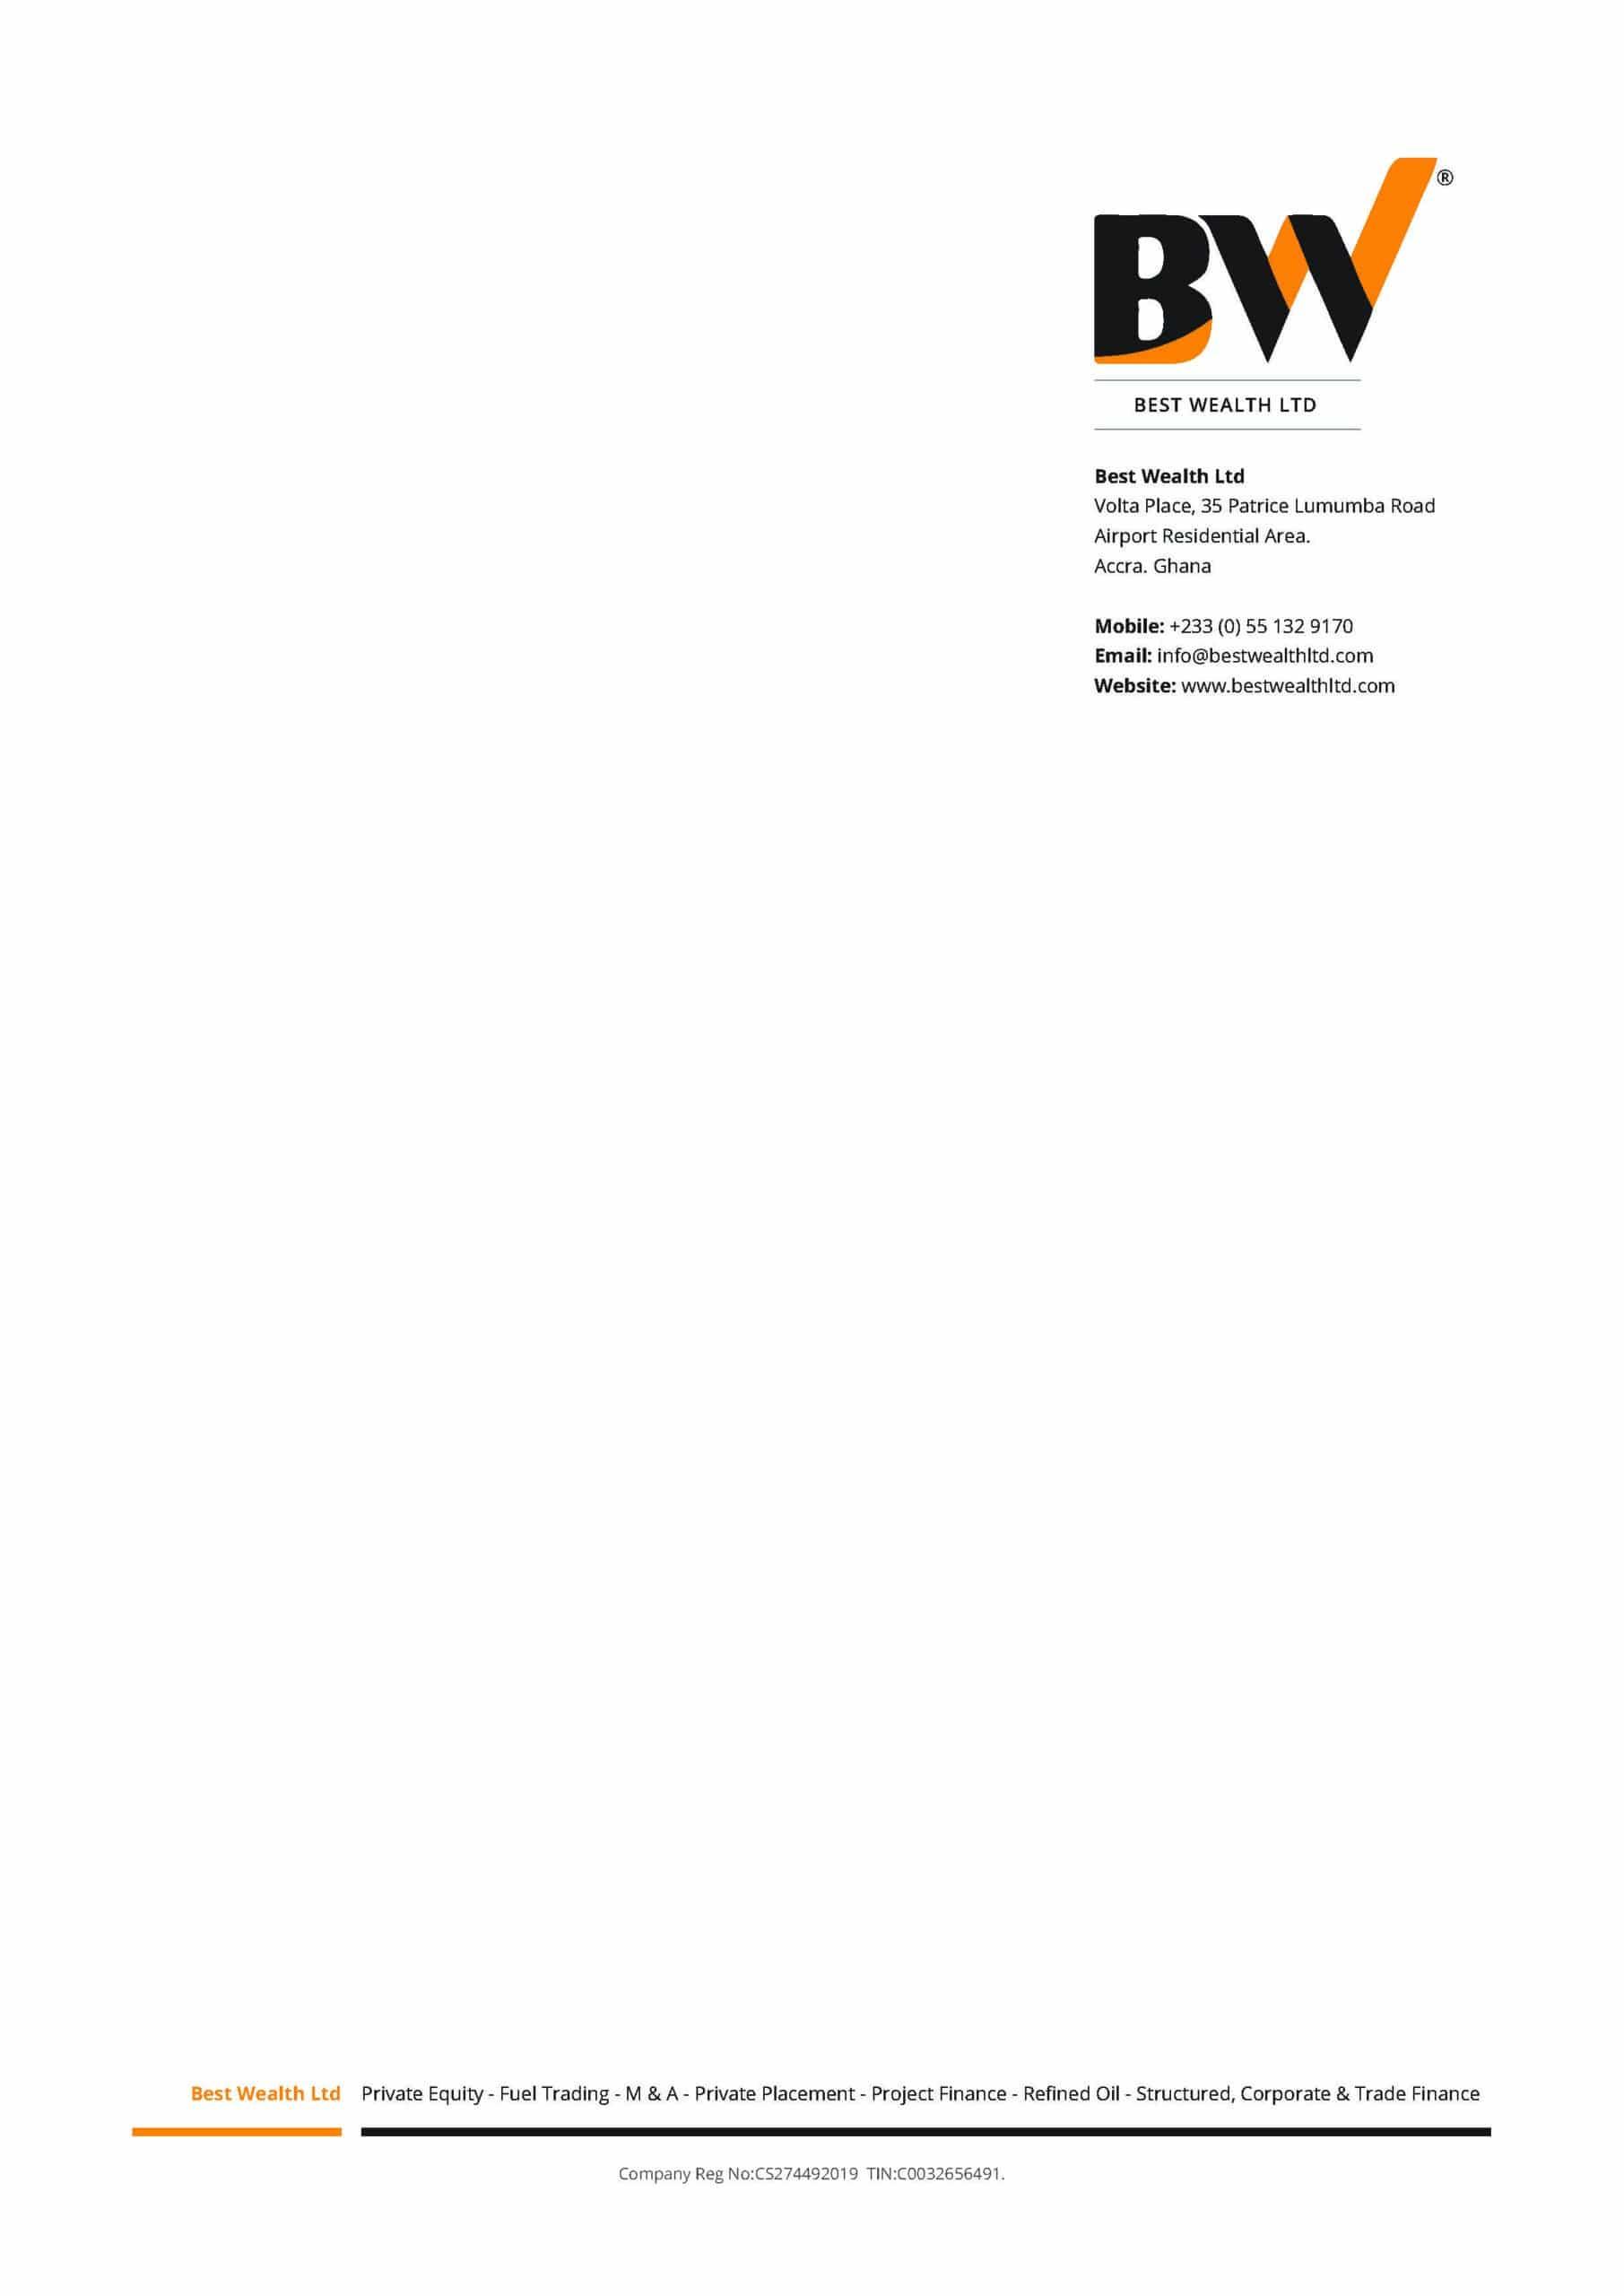 Letterhead-v1a_Page_1